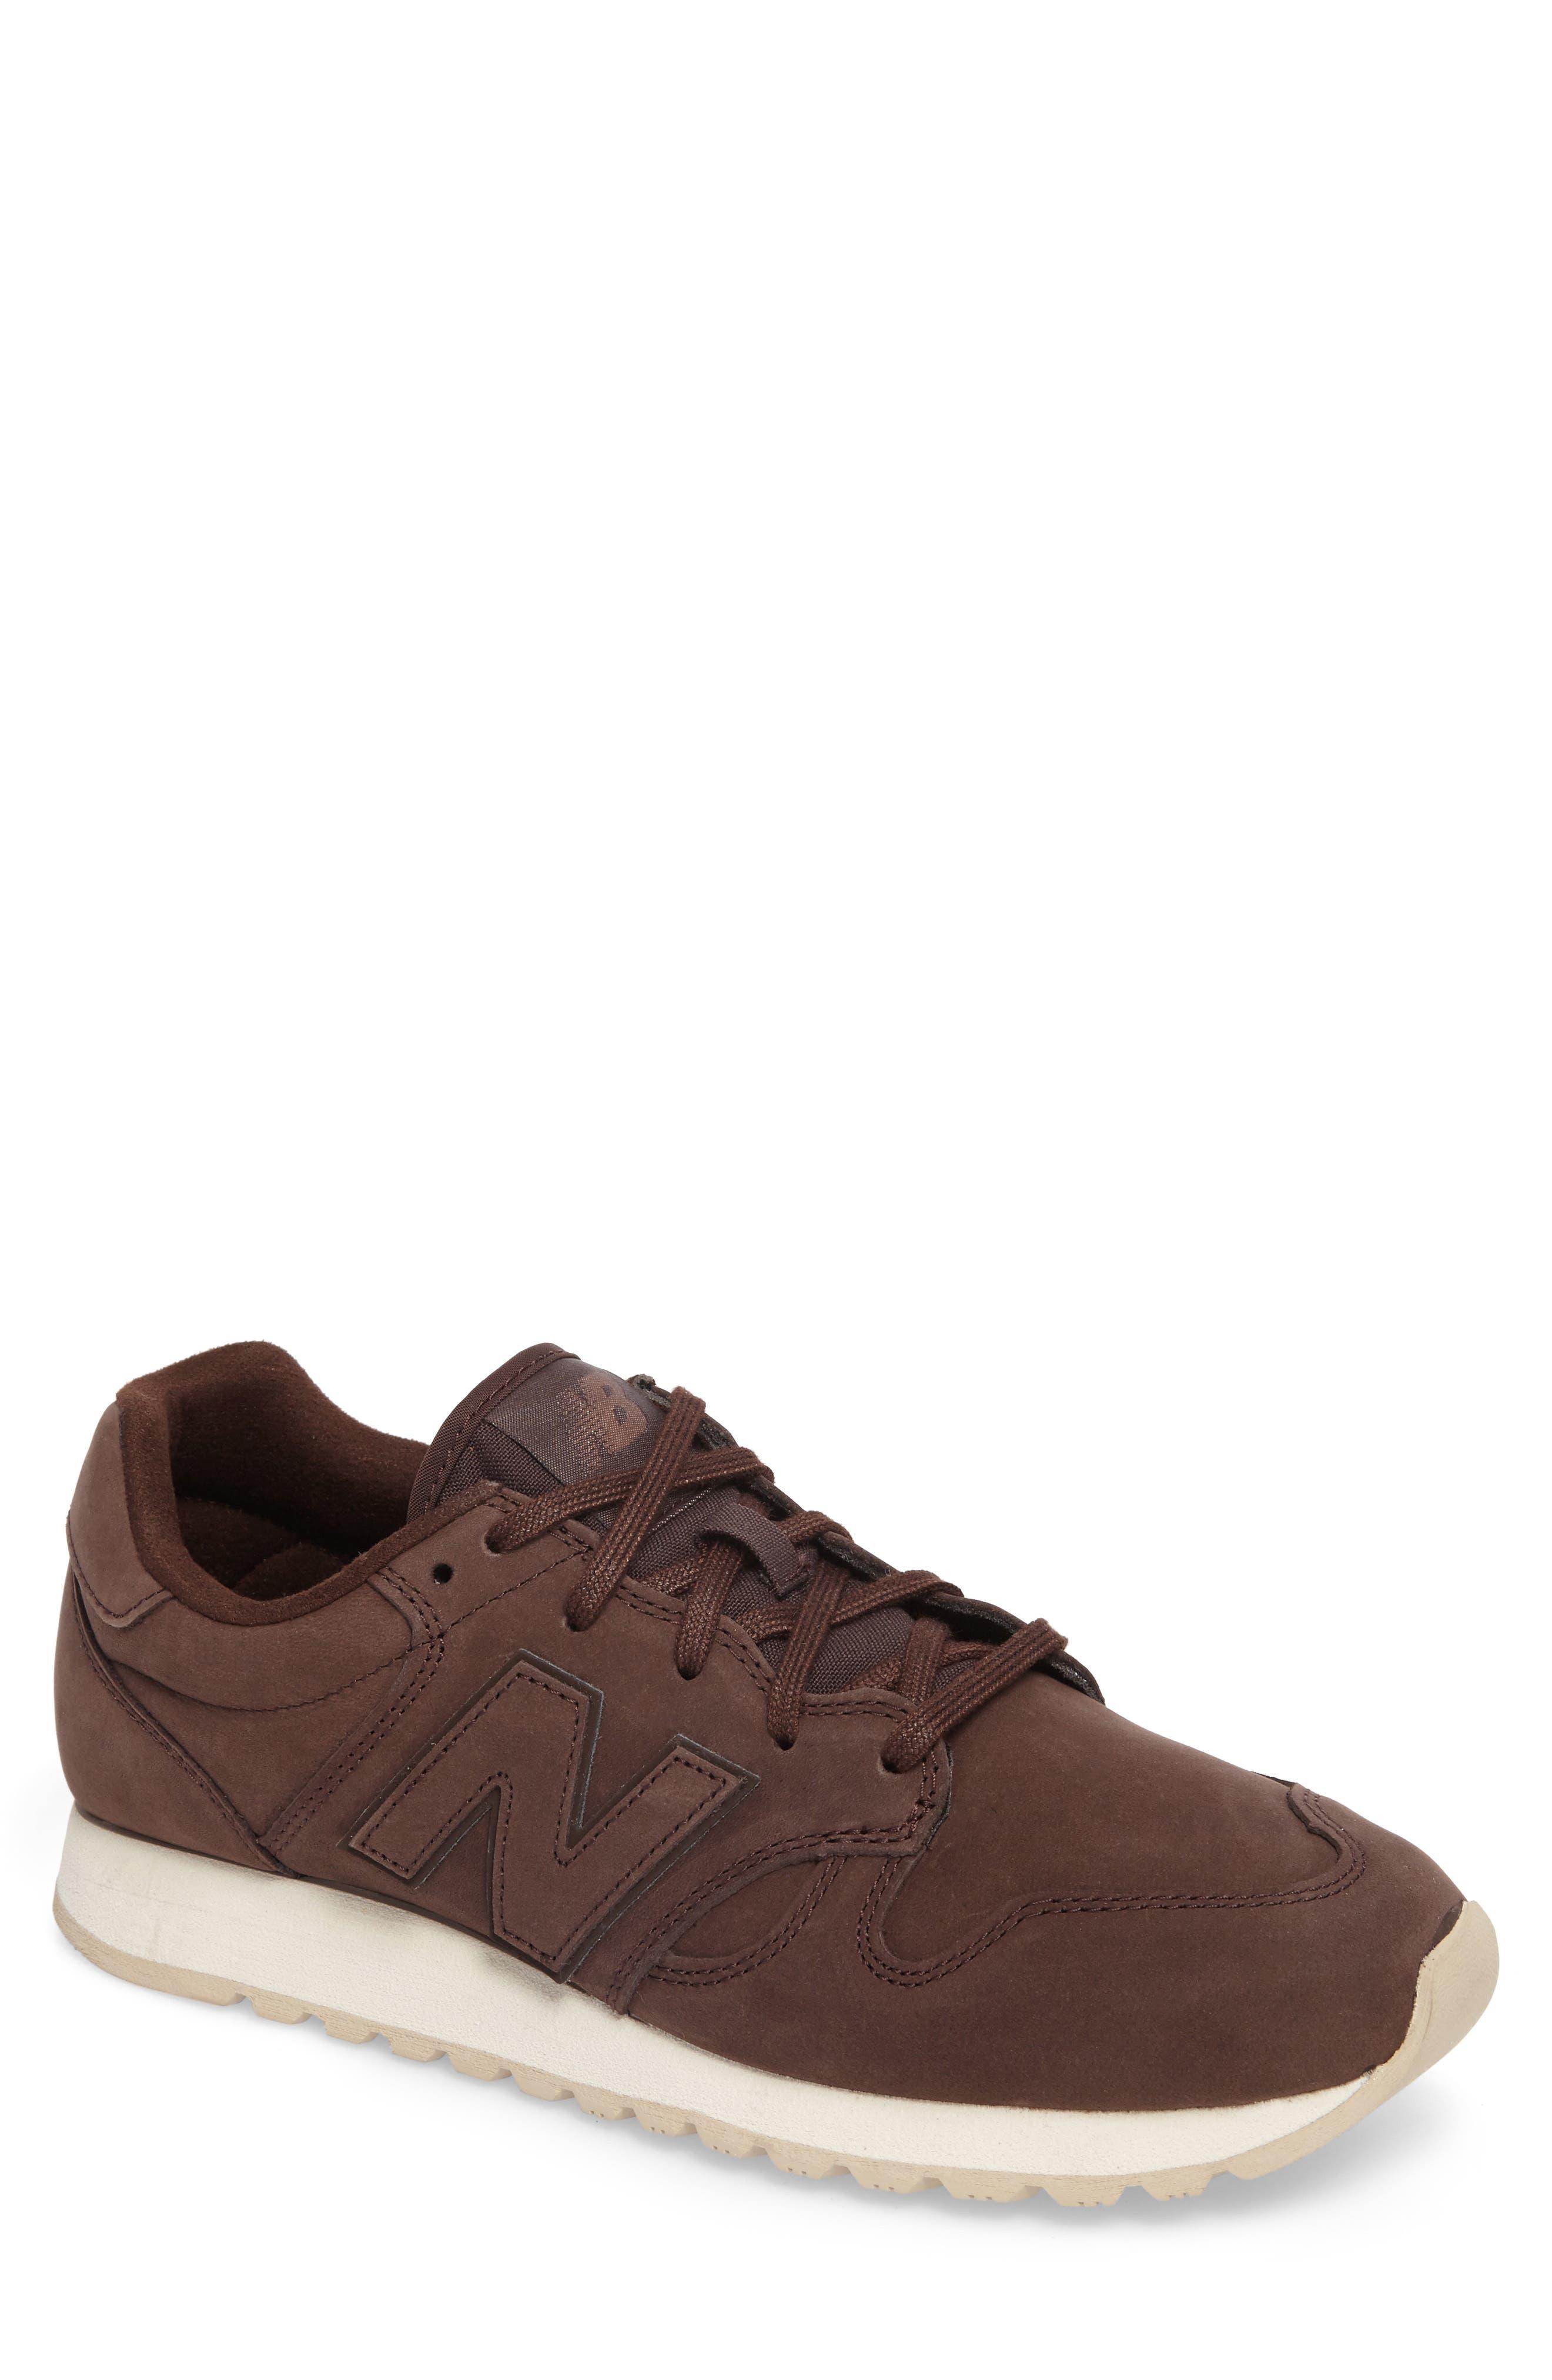 U520 Trainer Sneaker,                         Main,                         color,